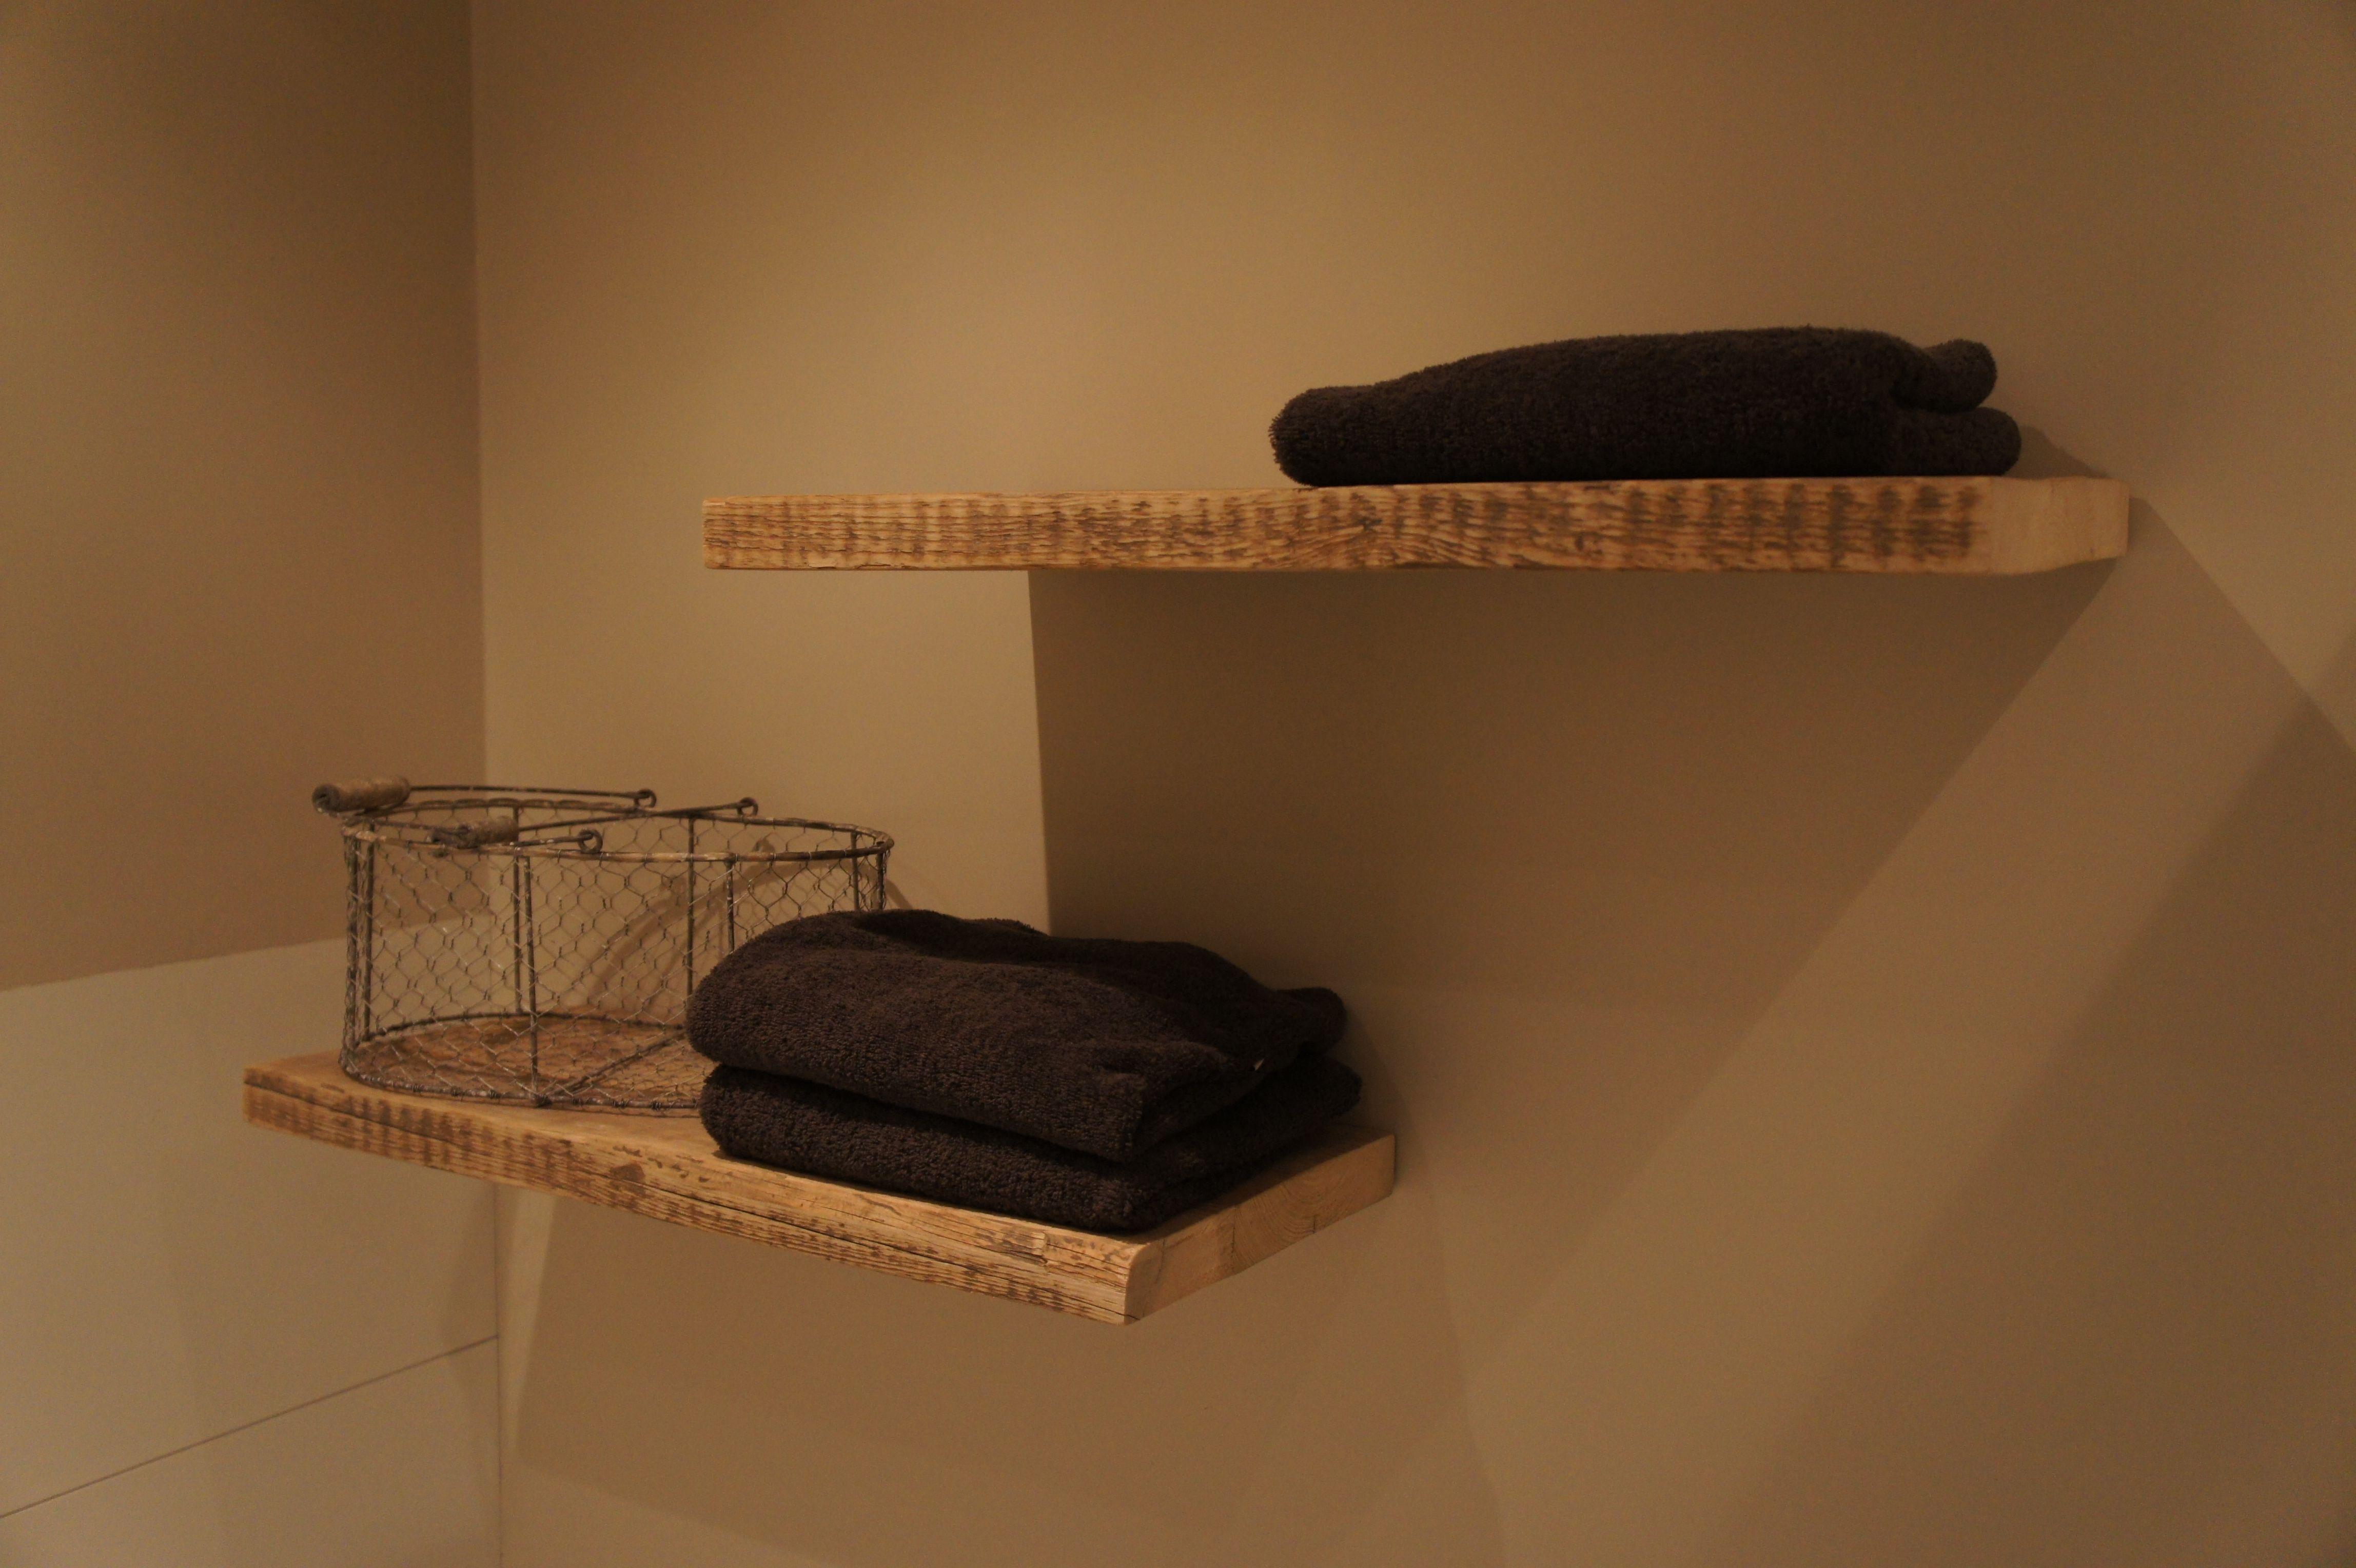 Blinde Houten Wandplank.Wandplank Keuken Interieur Inspiratie X Wandplanken In De Keuken